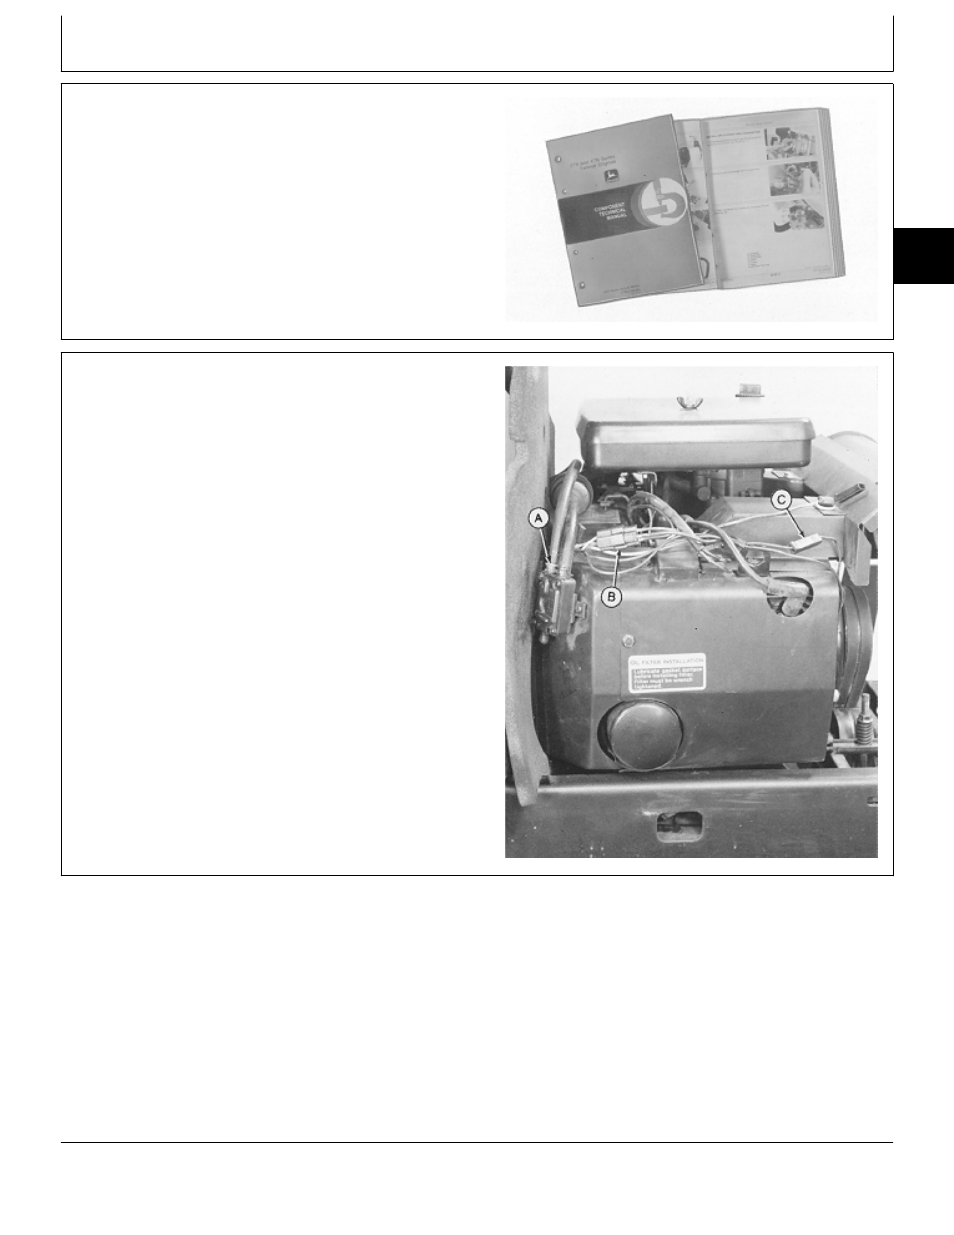 engine onan engine repair use ctm2 remove and install engine rh manualsdir com john deere 318 parts manual john deere 318 repair manual free download